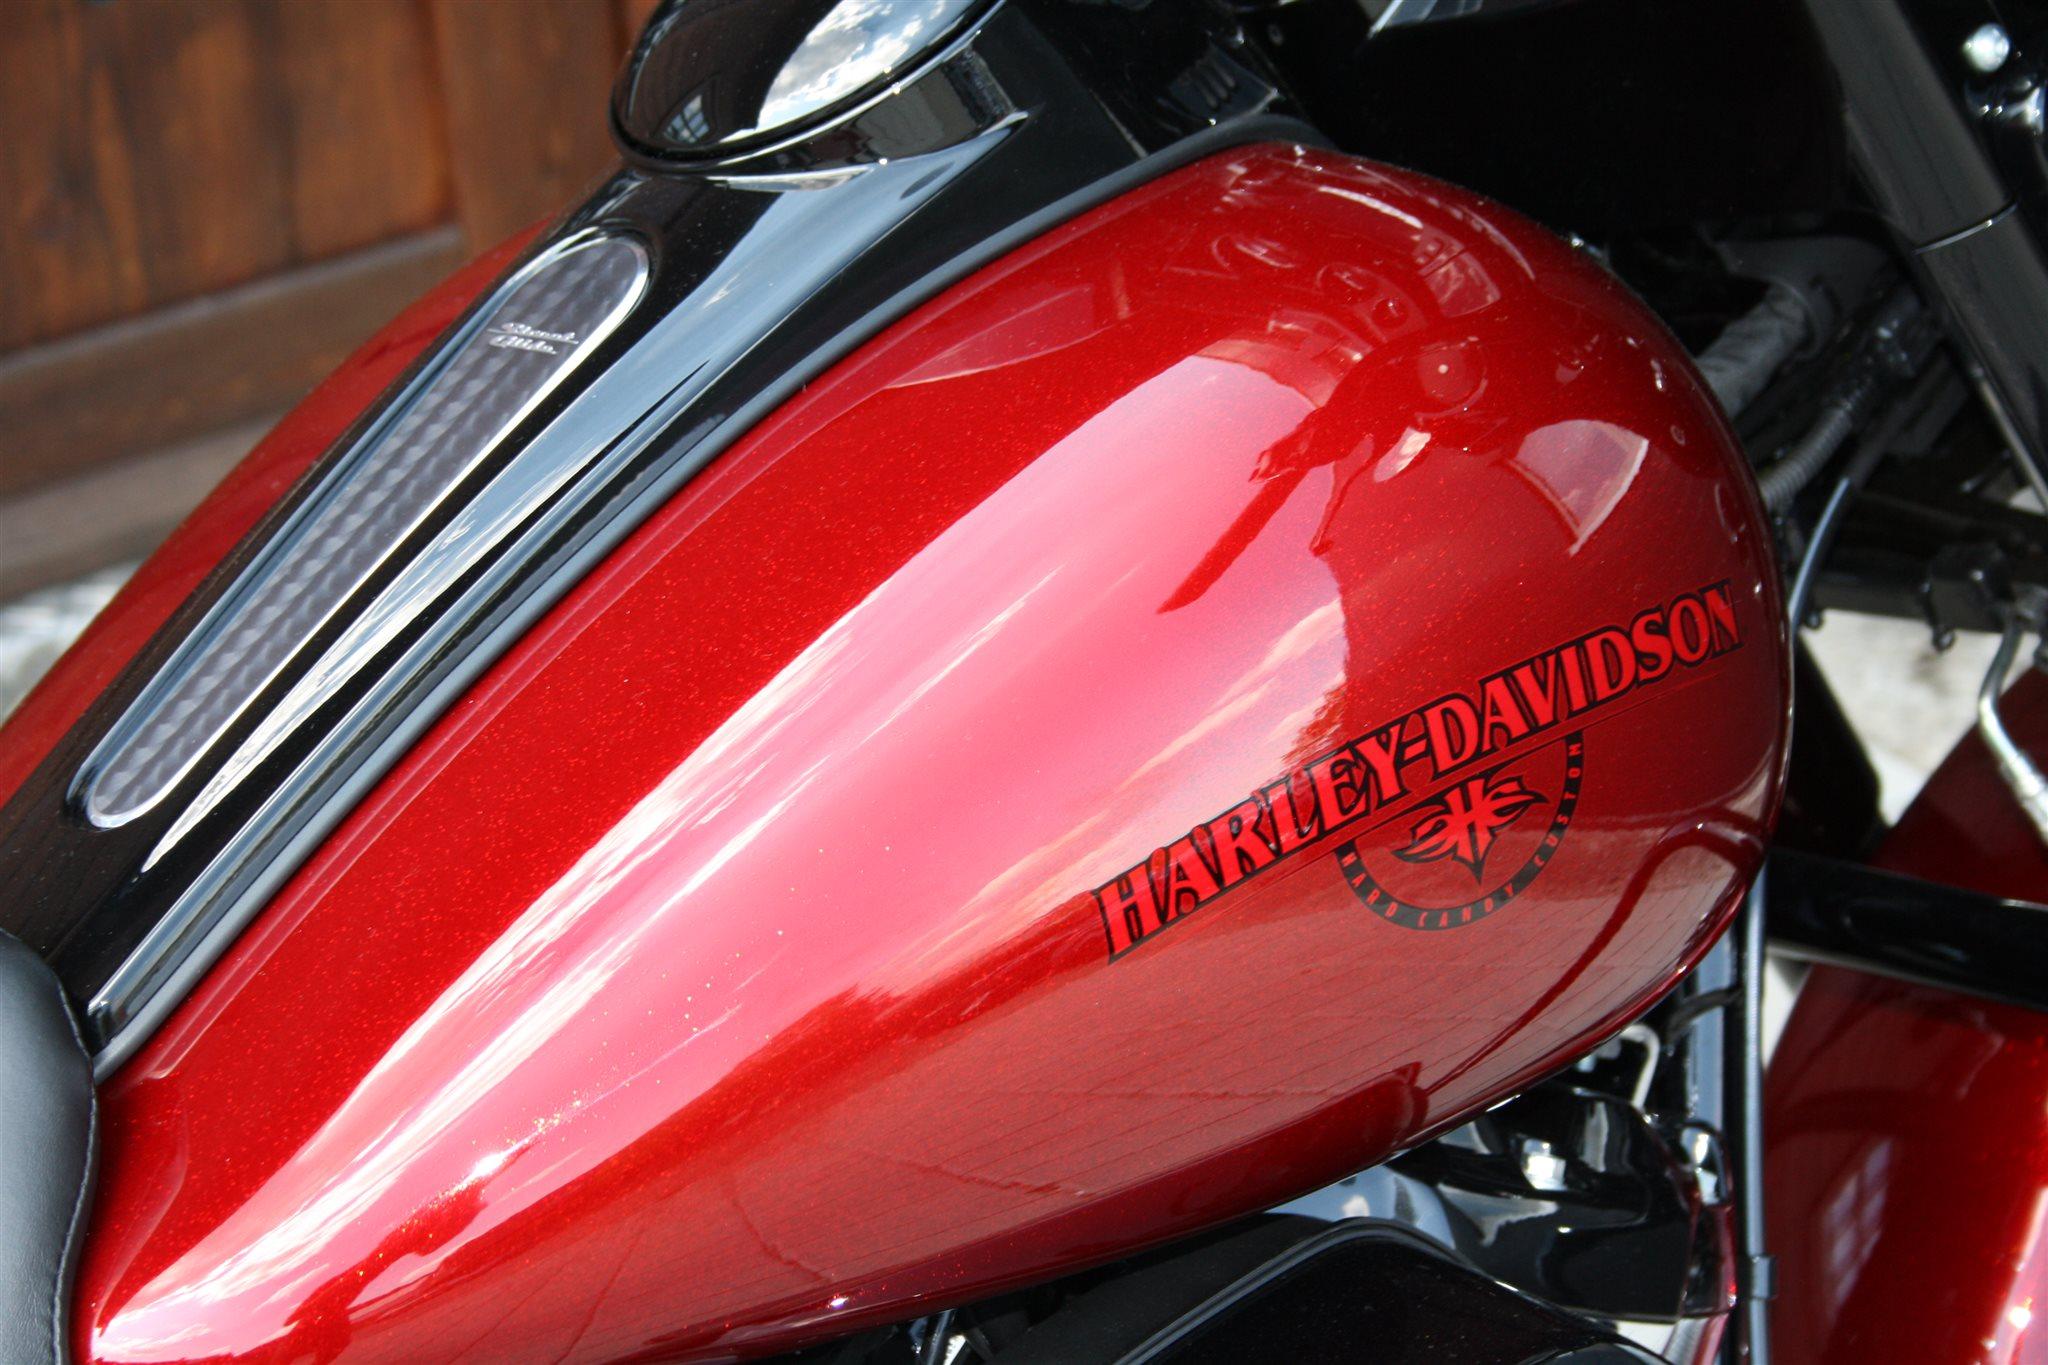 Neumotorrad Harley Davidson Street Glide Special Flhxs Baujahr Pink Motorcycle Angebot